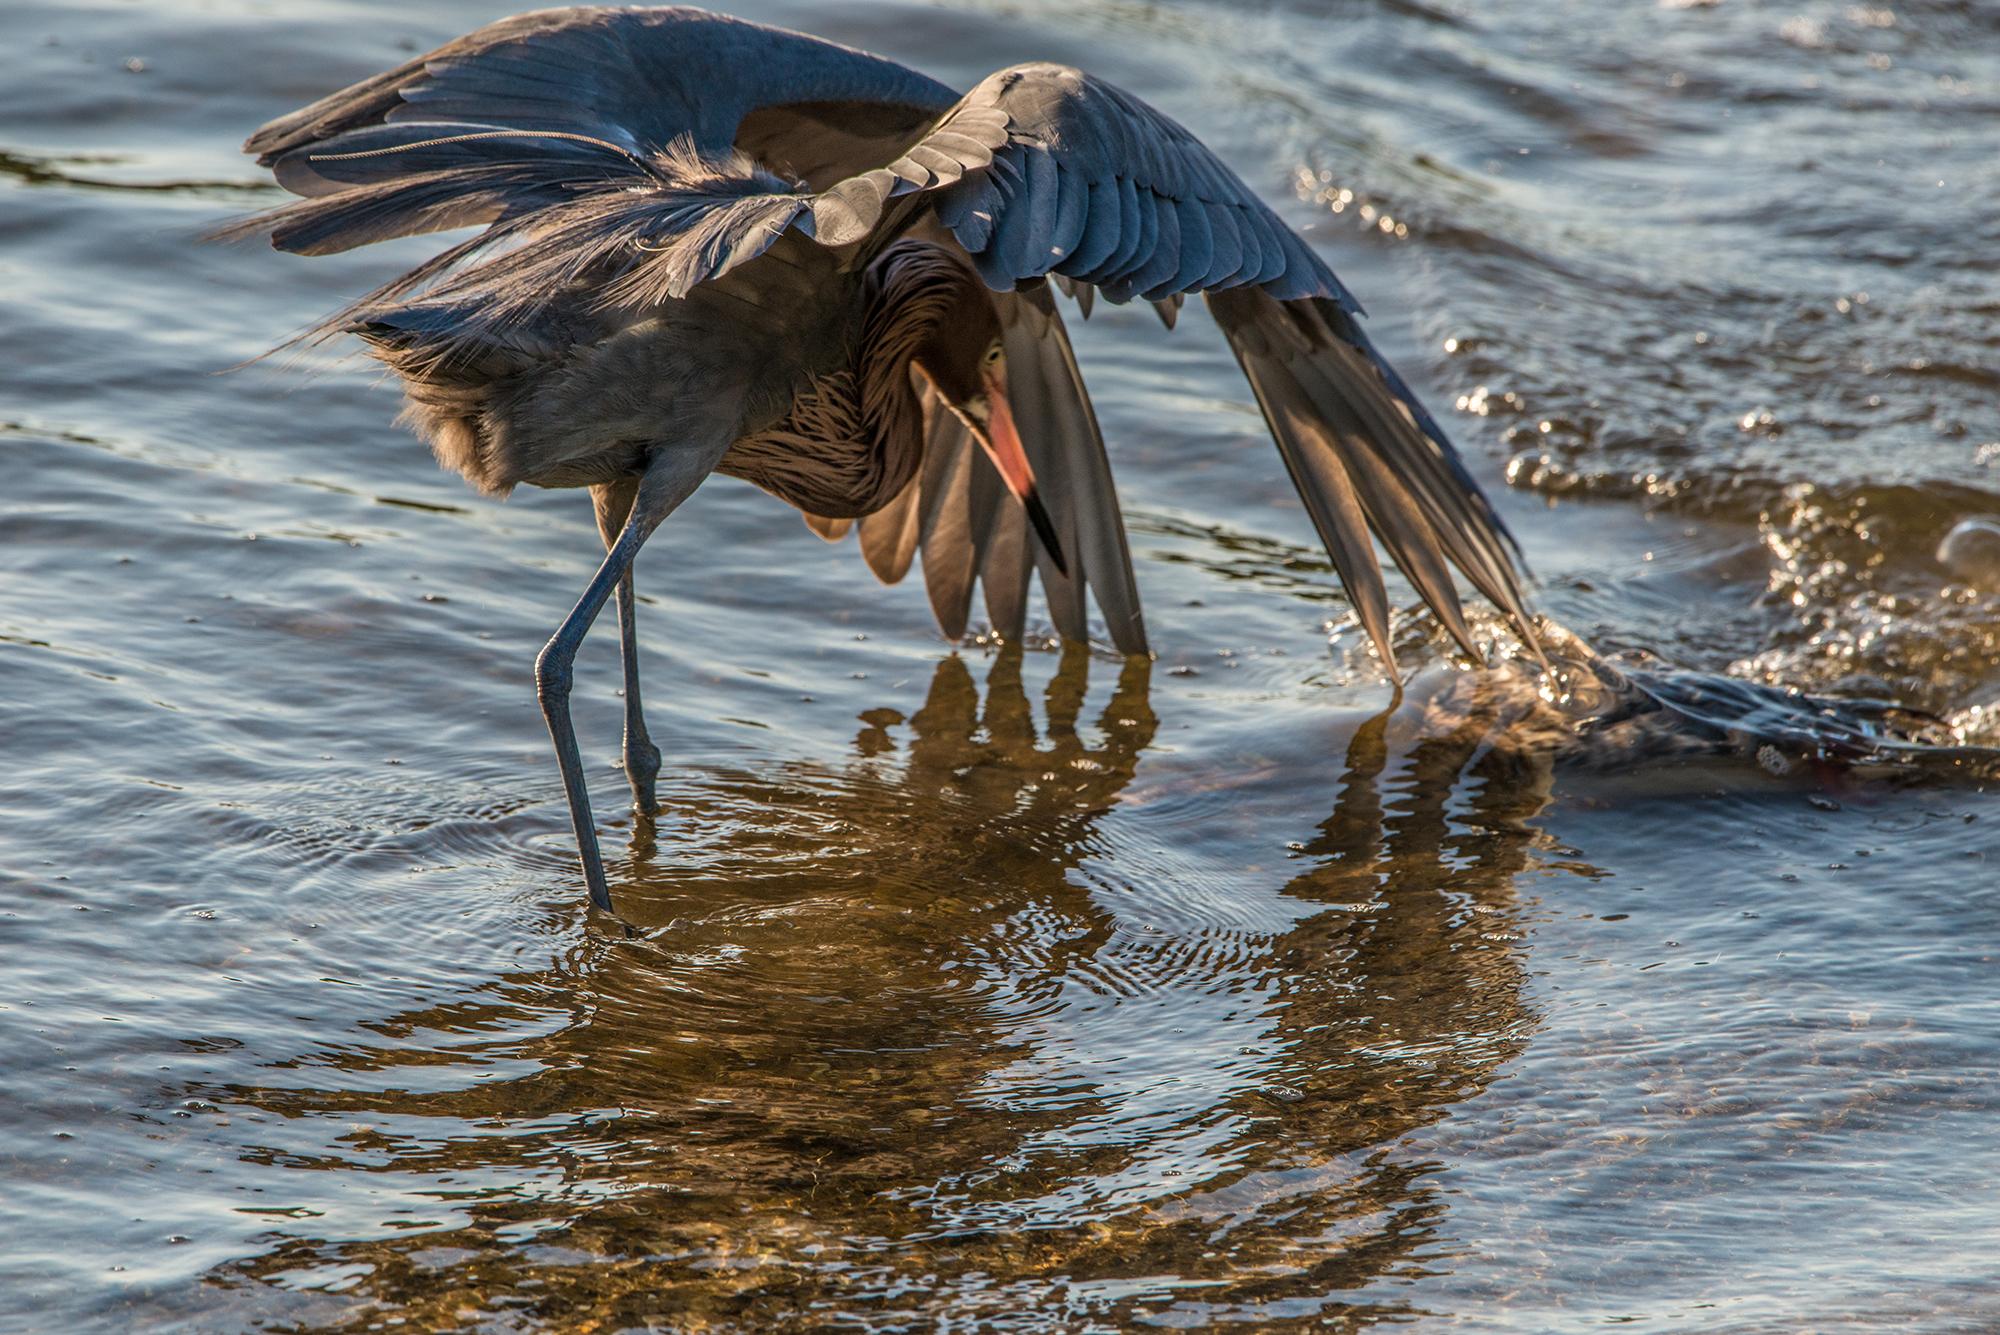 #reddishegret, #heron, #dance, #feeding, #sanibel, #dingdarling, #behavior, #florida, #wadingbird, #bird #tamron, #nikon